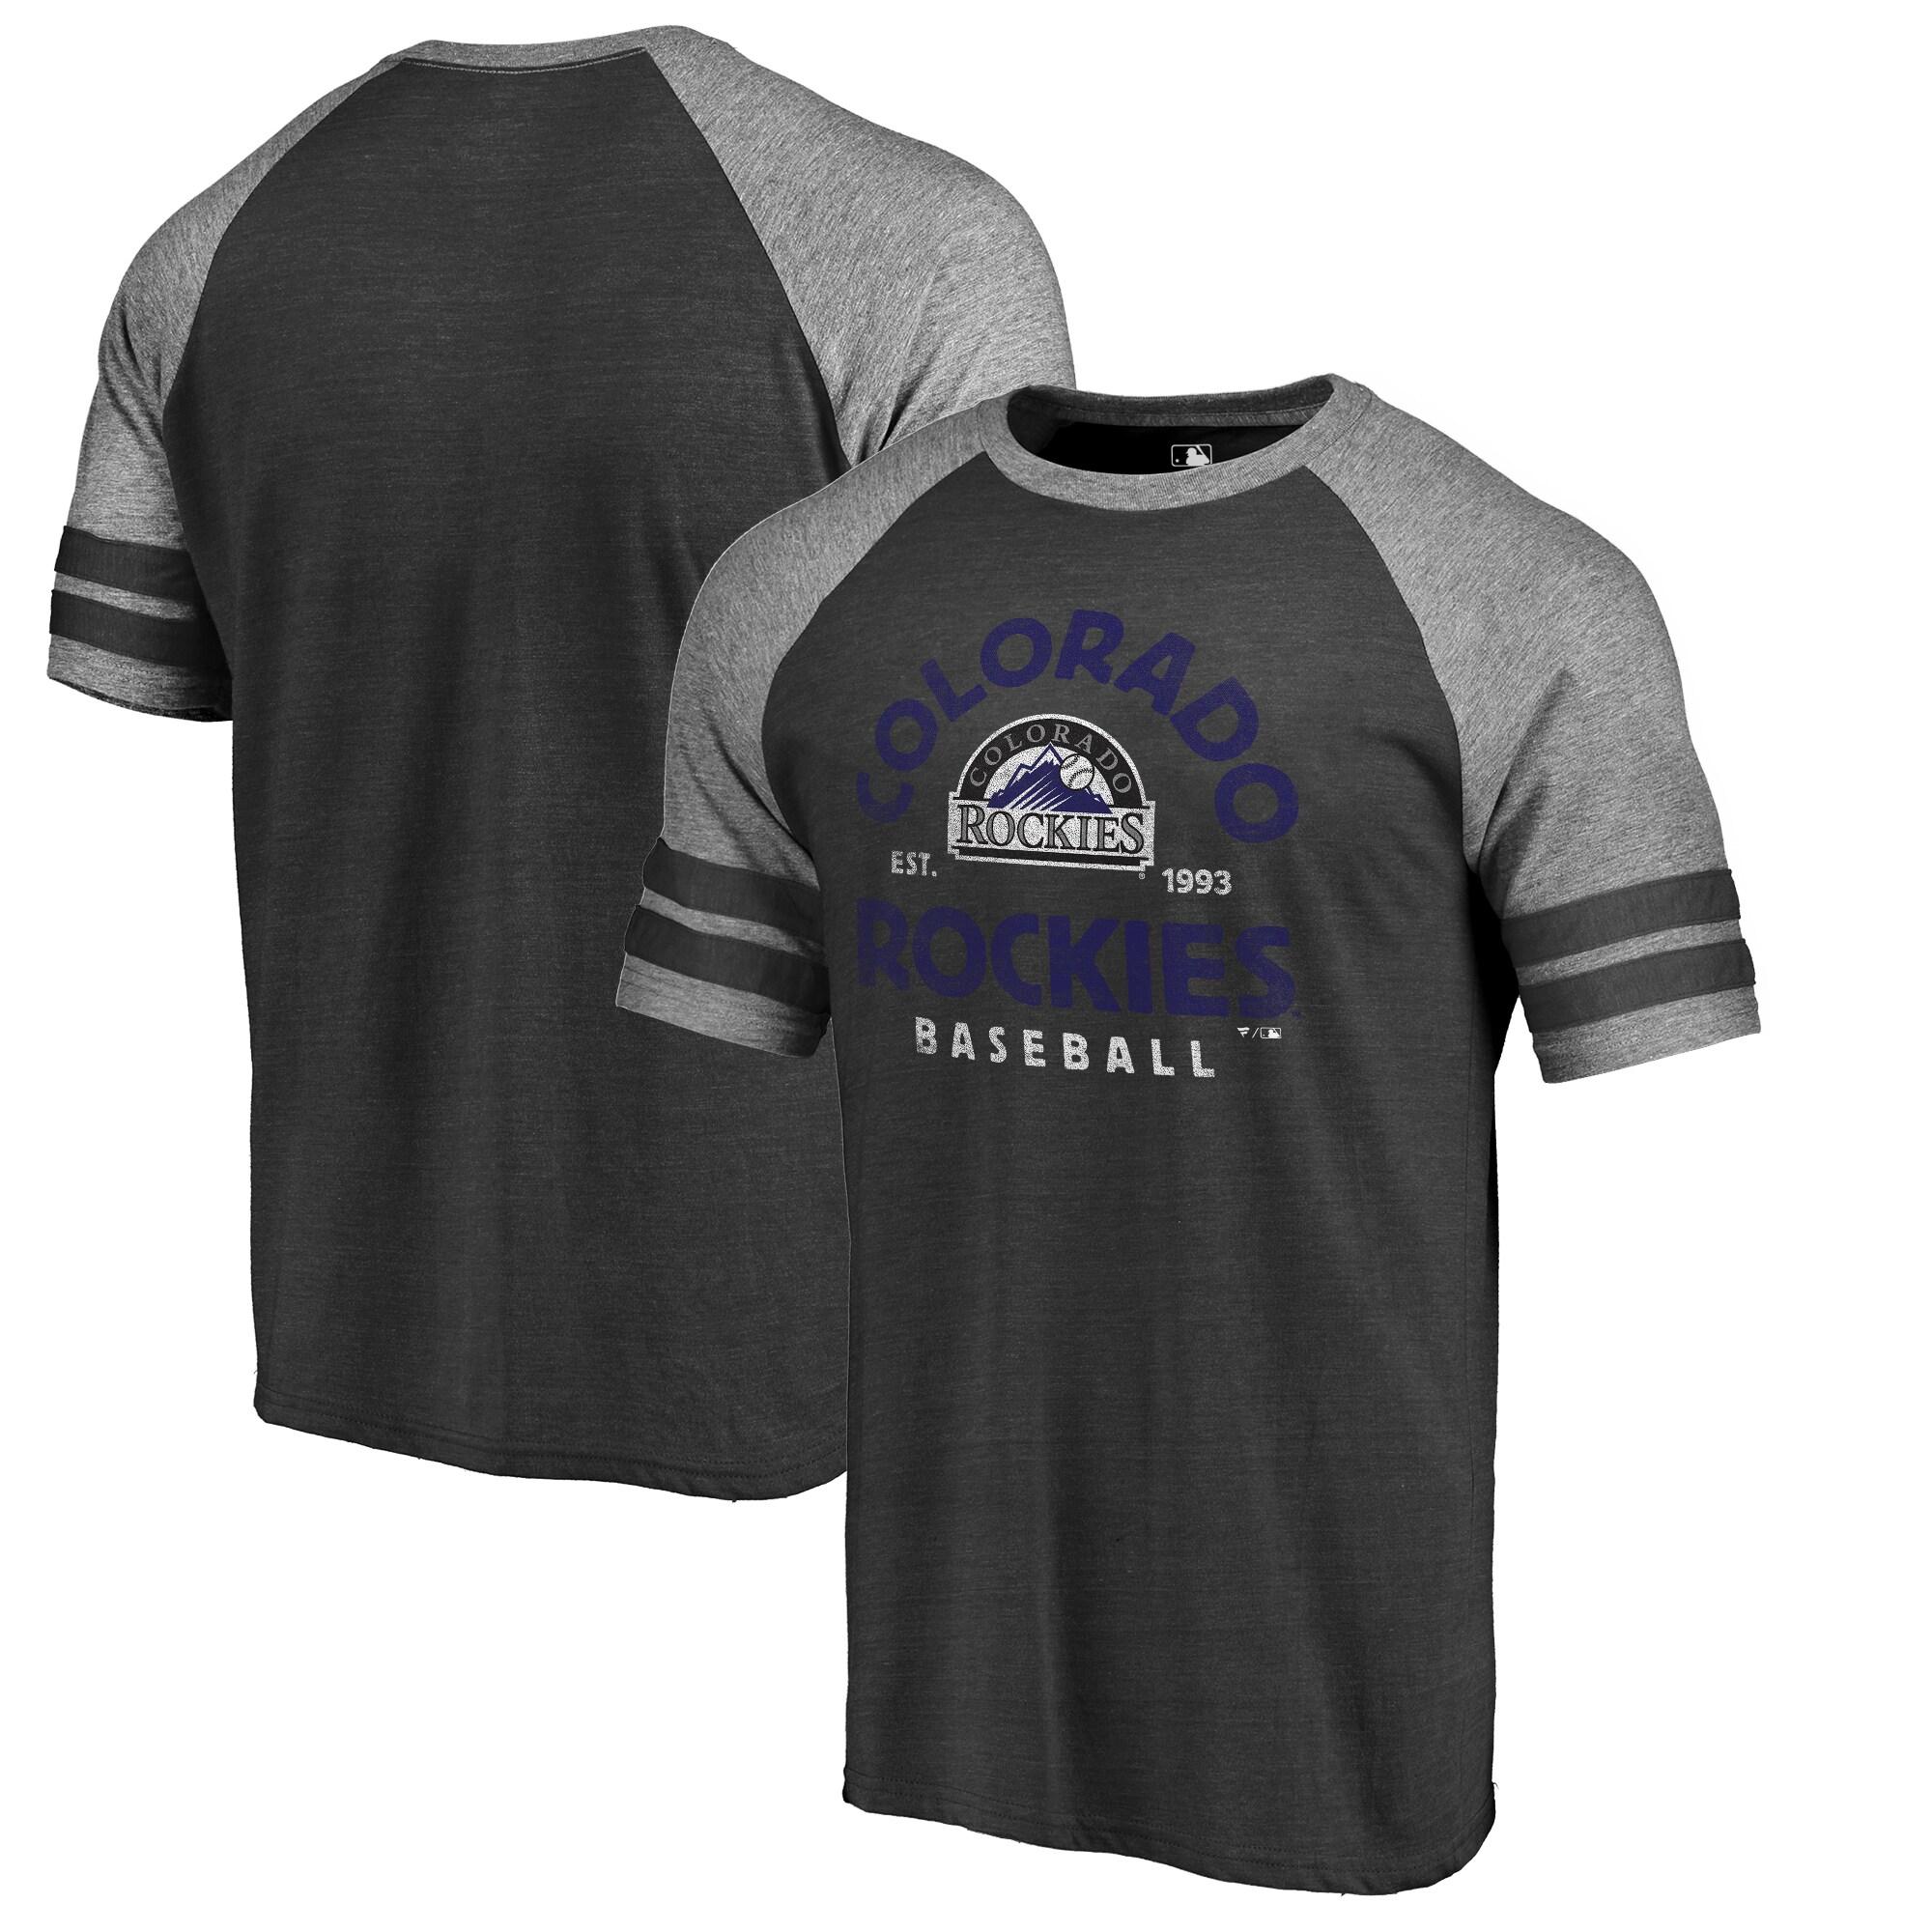 Colorado Rockies Fanatics Branded Cooperstown Collection Vintage Arch Tri-Blend Raglan T-Shirt - Black